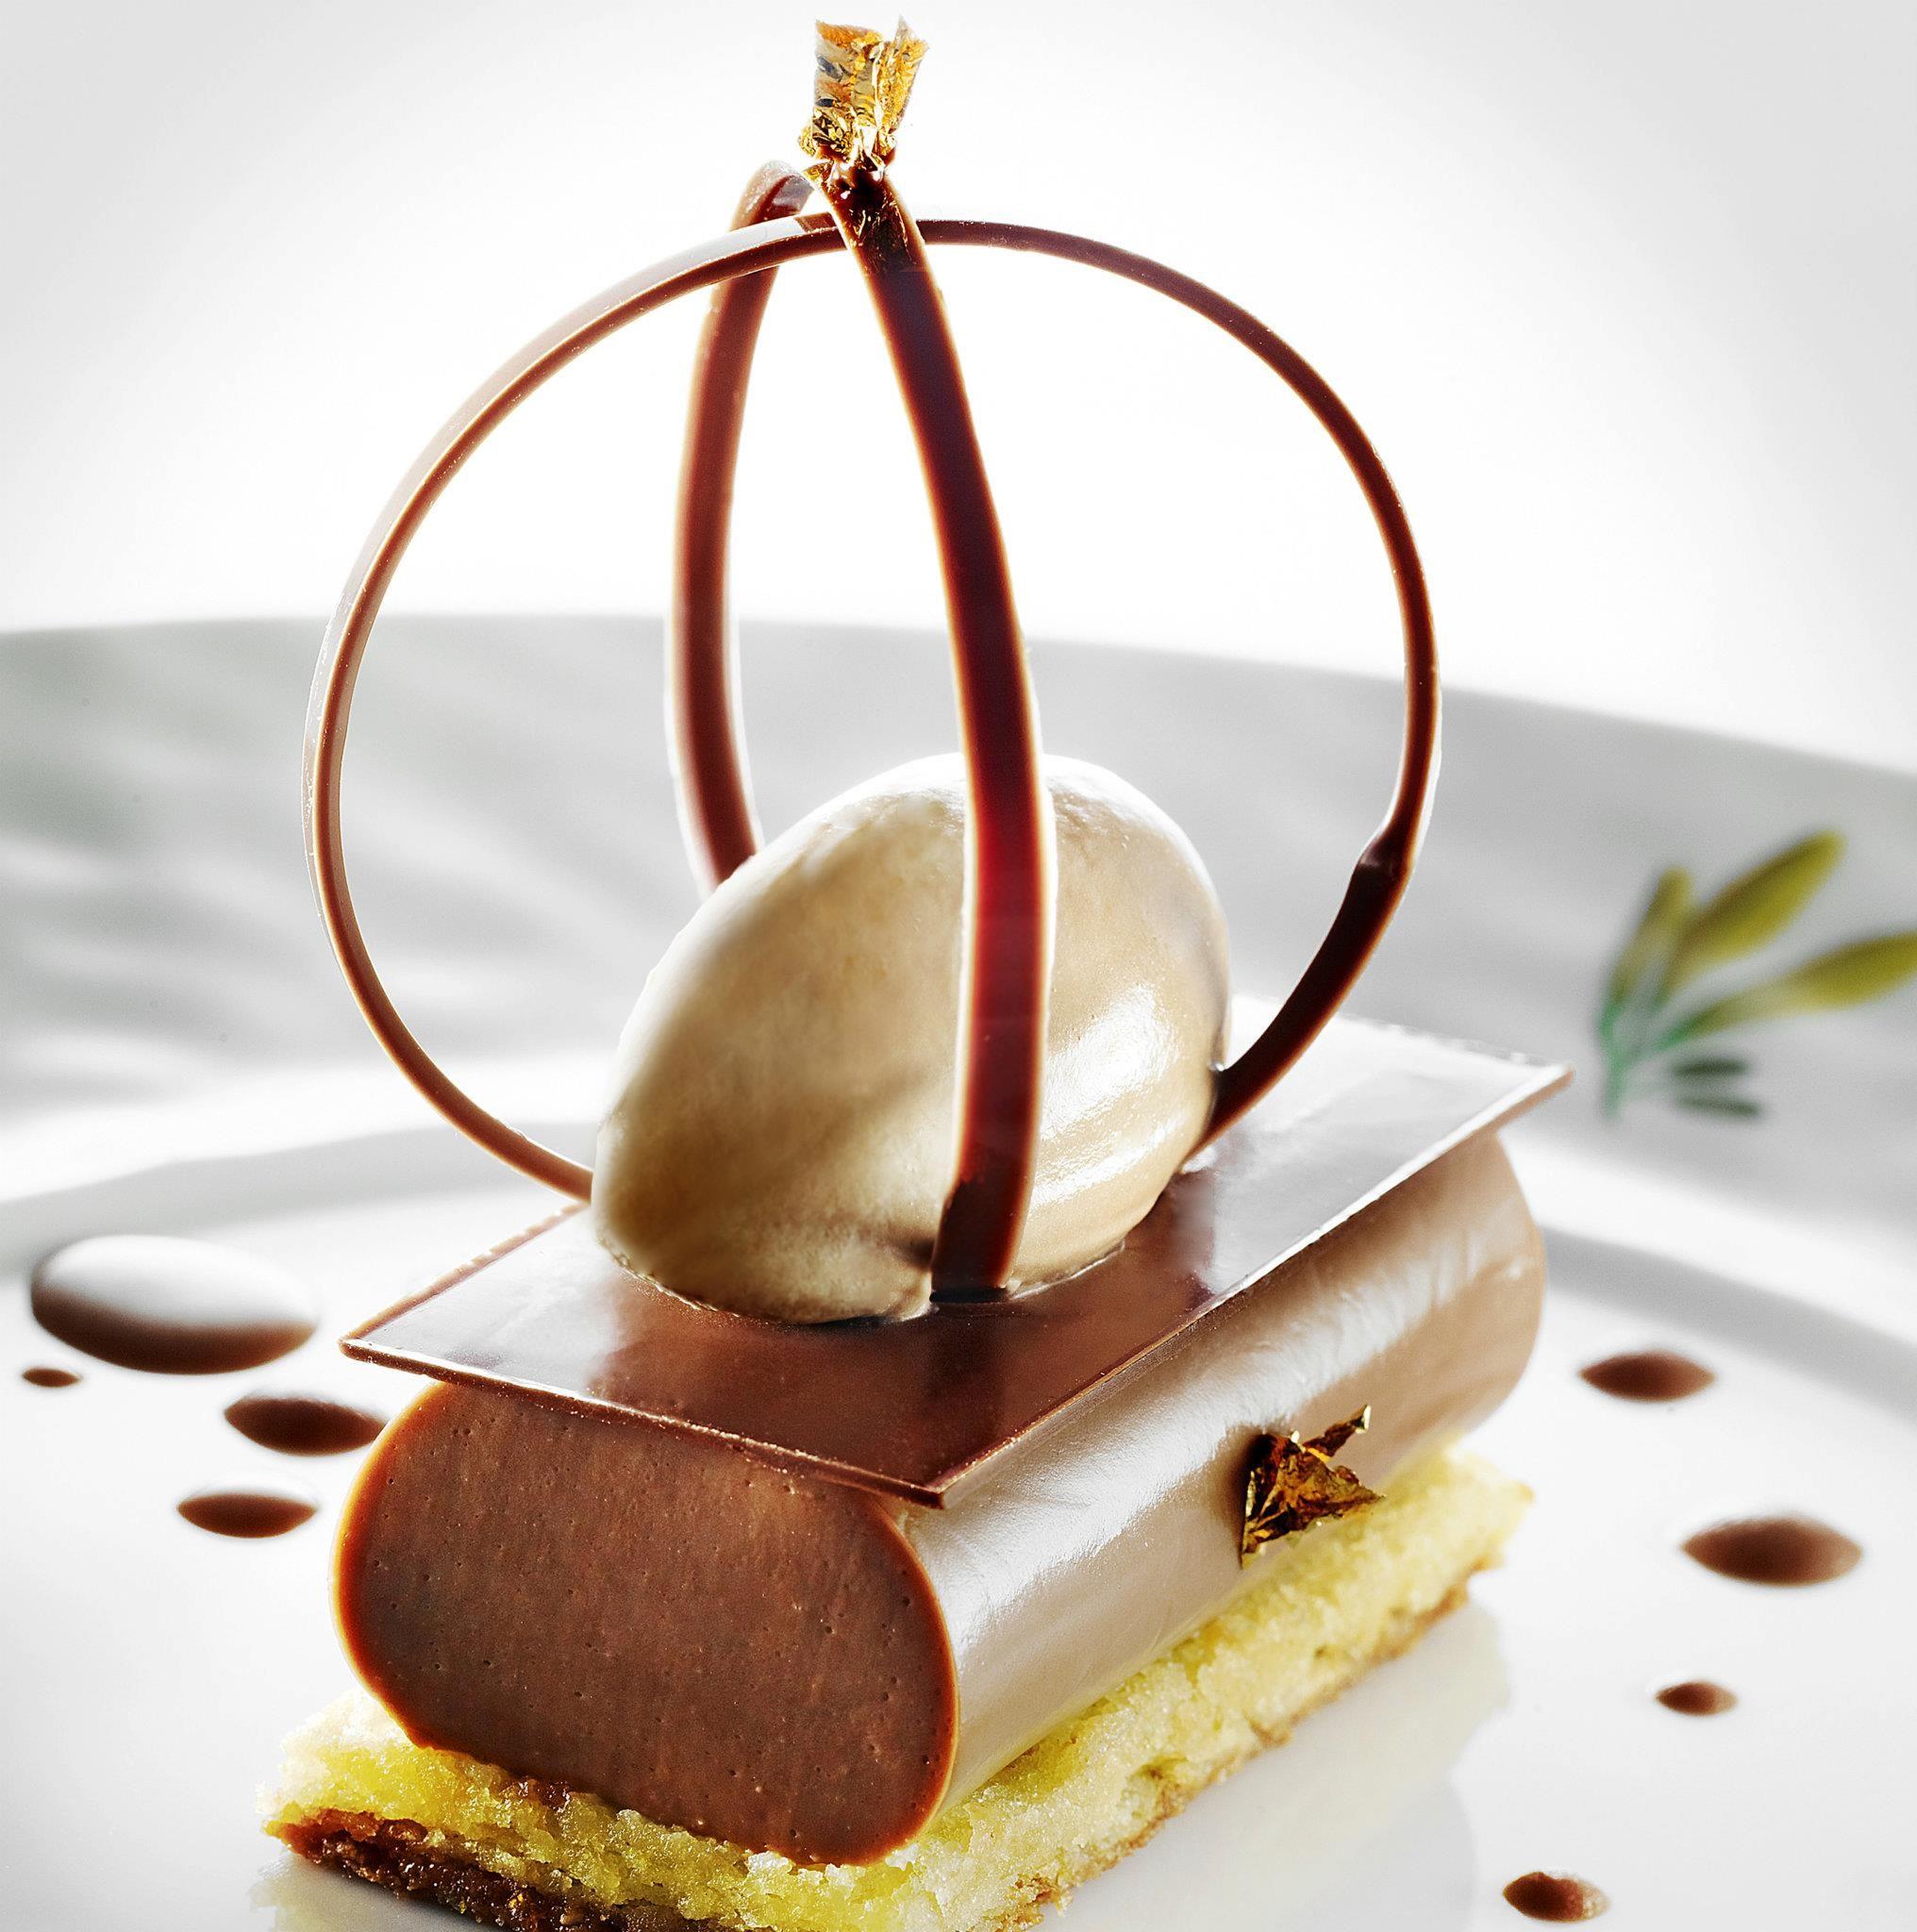 ch teau saint martin spa milk chocolate jivara 40 tender jelly lime ice cream fancy. Black Bedroom Furniture Sets. Home Design Ideas